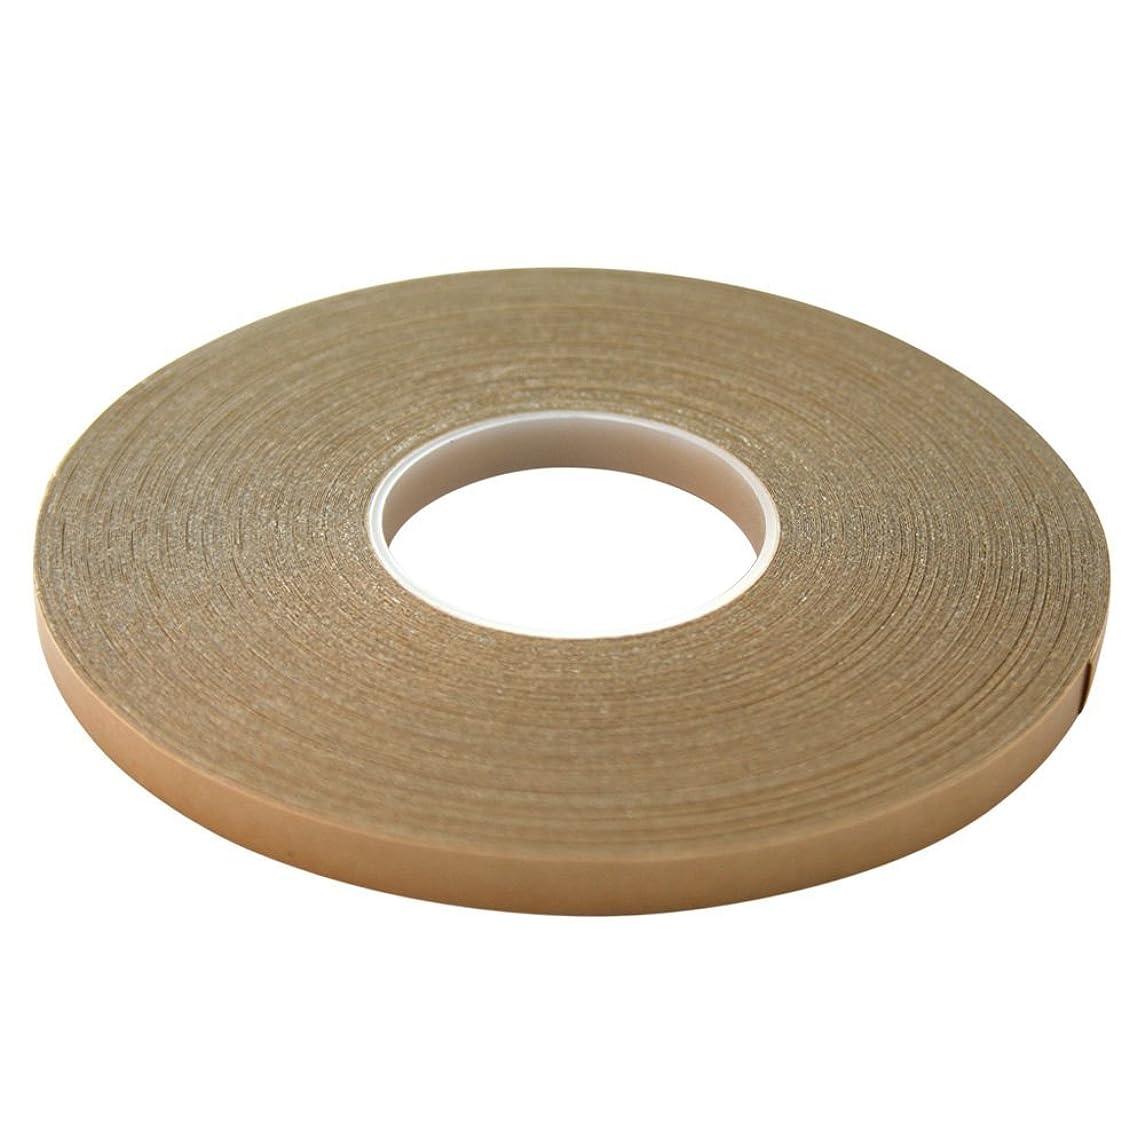 Sealah No Sew Double Sided Adhesive - 1/4 Inch Wide, 30 Yard Length